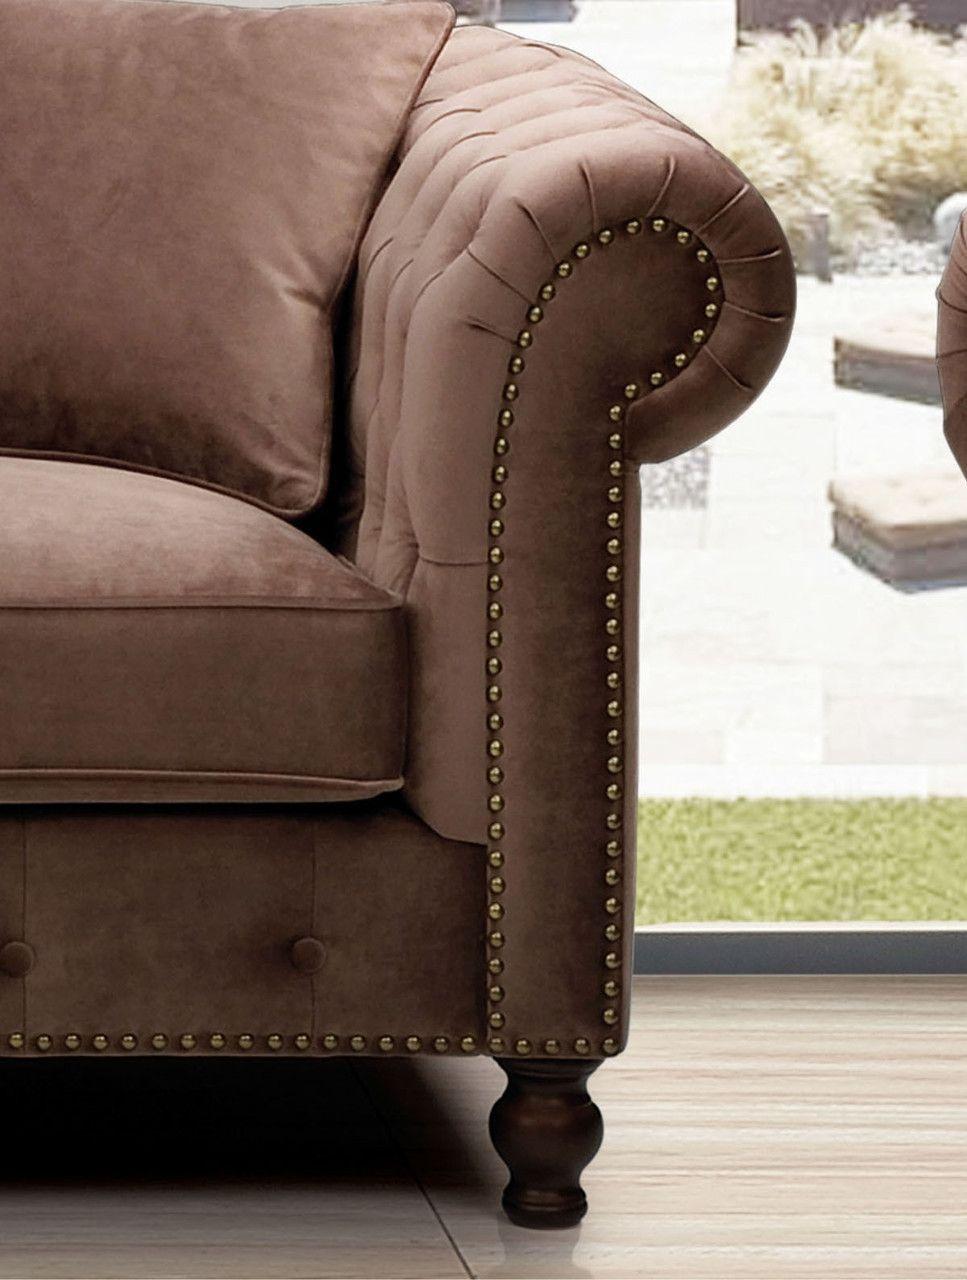 Microfiber Living Room Furniture Esf Sofa 108 D Loveseats And Brown